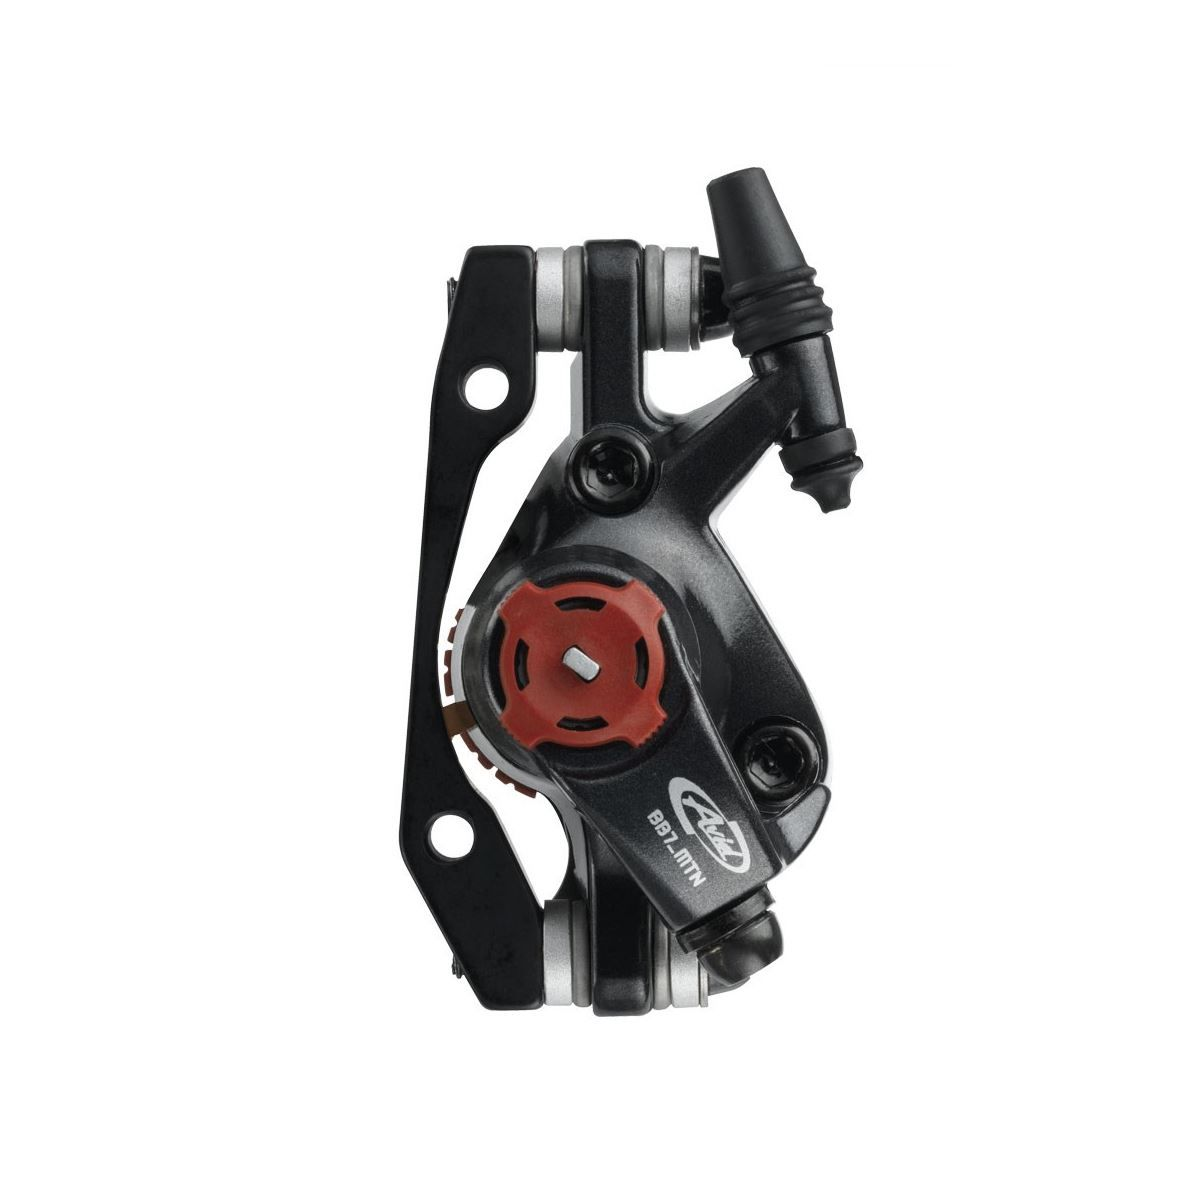 Avid Disc Brake Bb7 Mtb Graphite Cps (Rotor/Bracket Sold Separately):